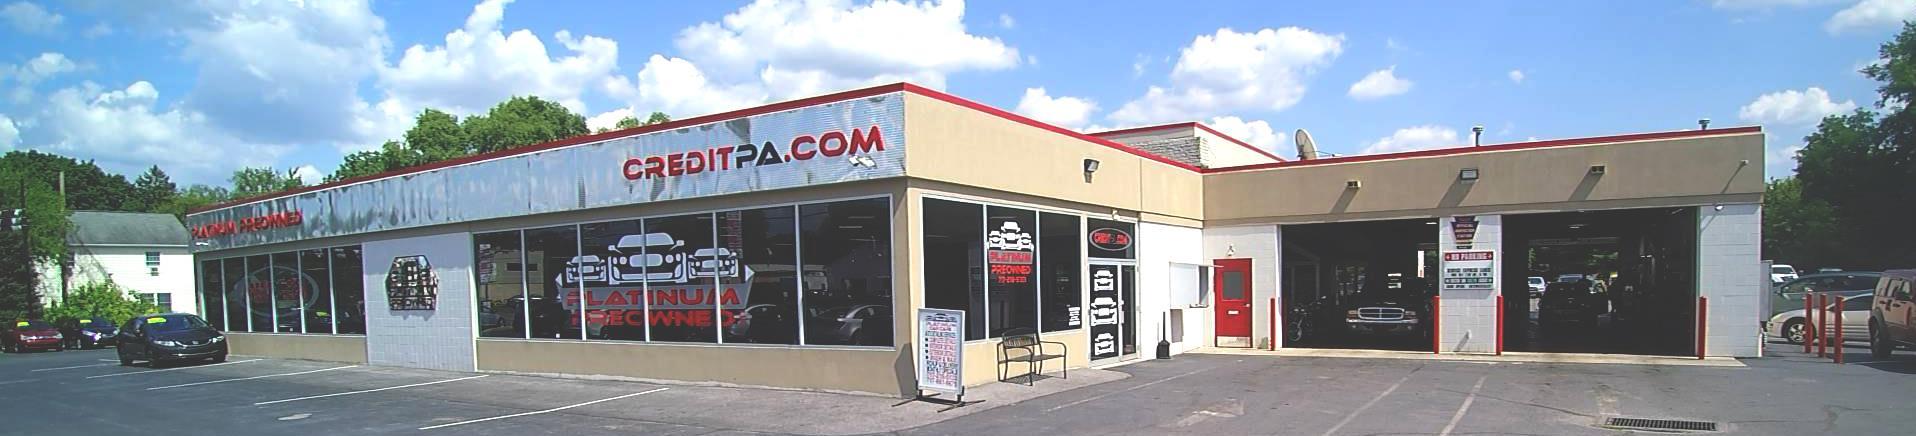 Car Loan Calculator Kbb >> Used Cars Carlisle PA | Used Cars & Trucks PA | Platinum Preowned LLC